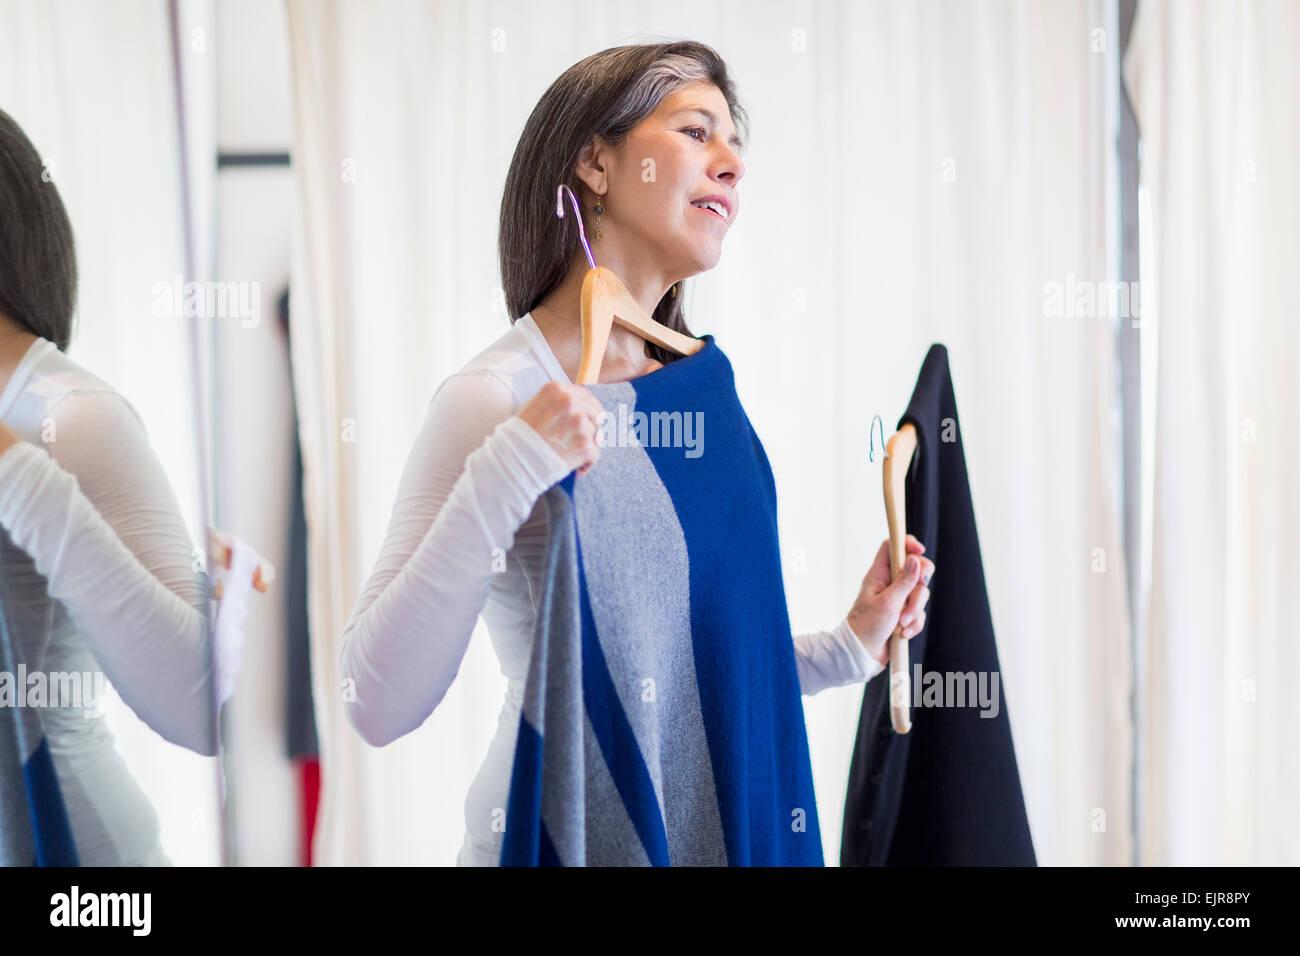 Hispanic woman browsing clothing in store Stock Photo